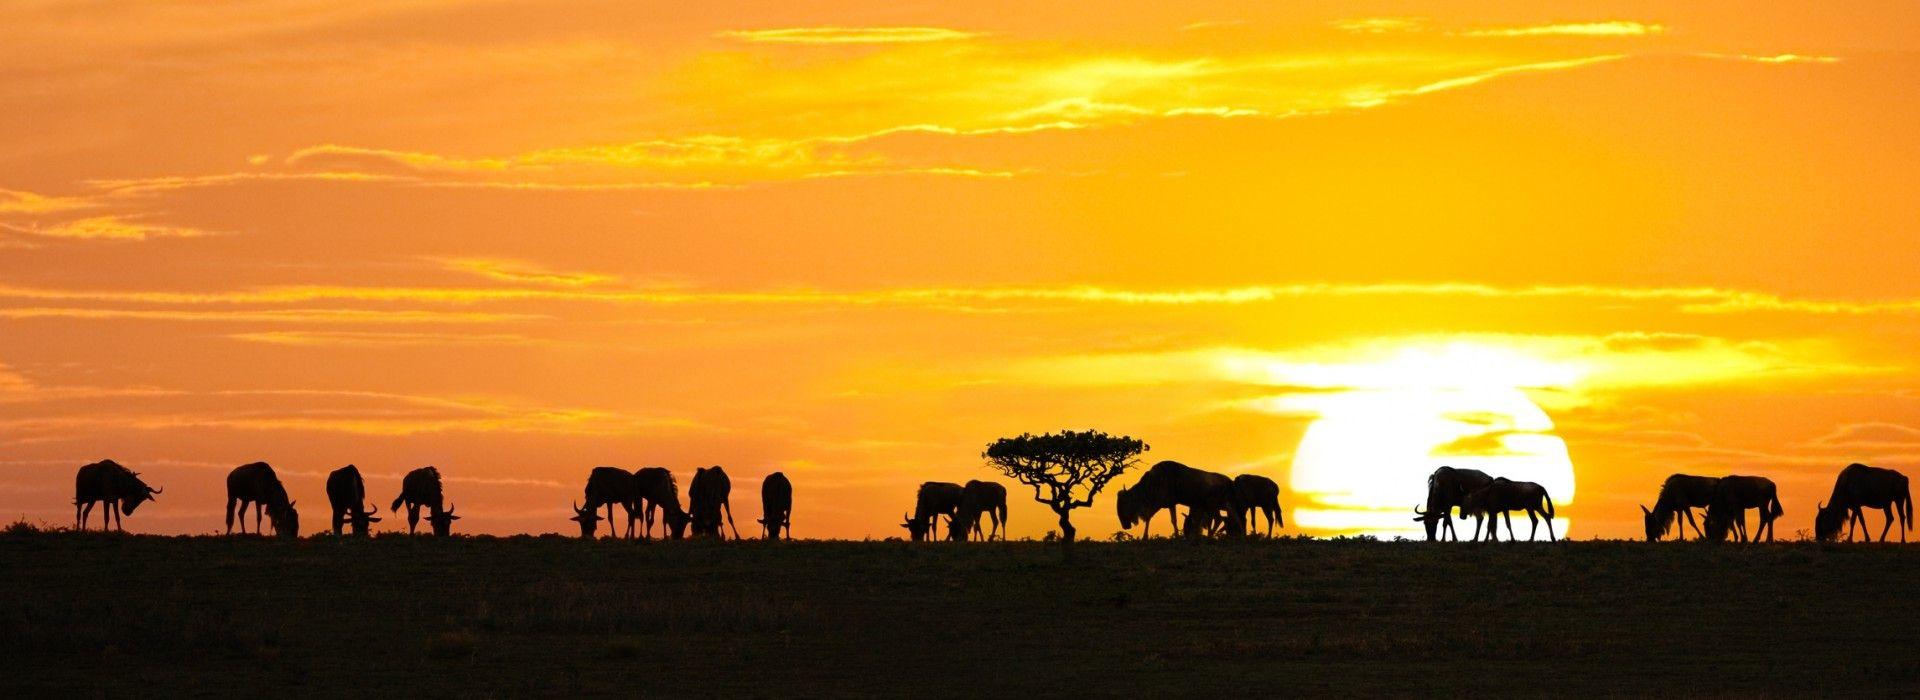 Road trips Tours in Tanzania